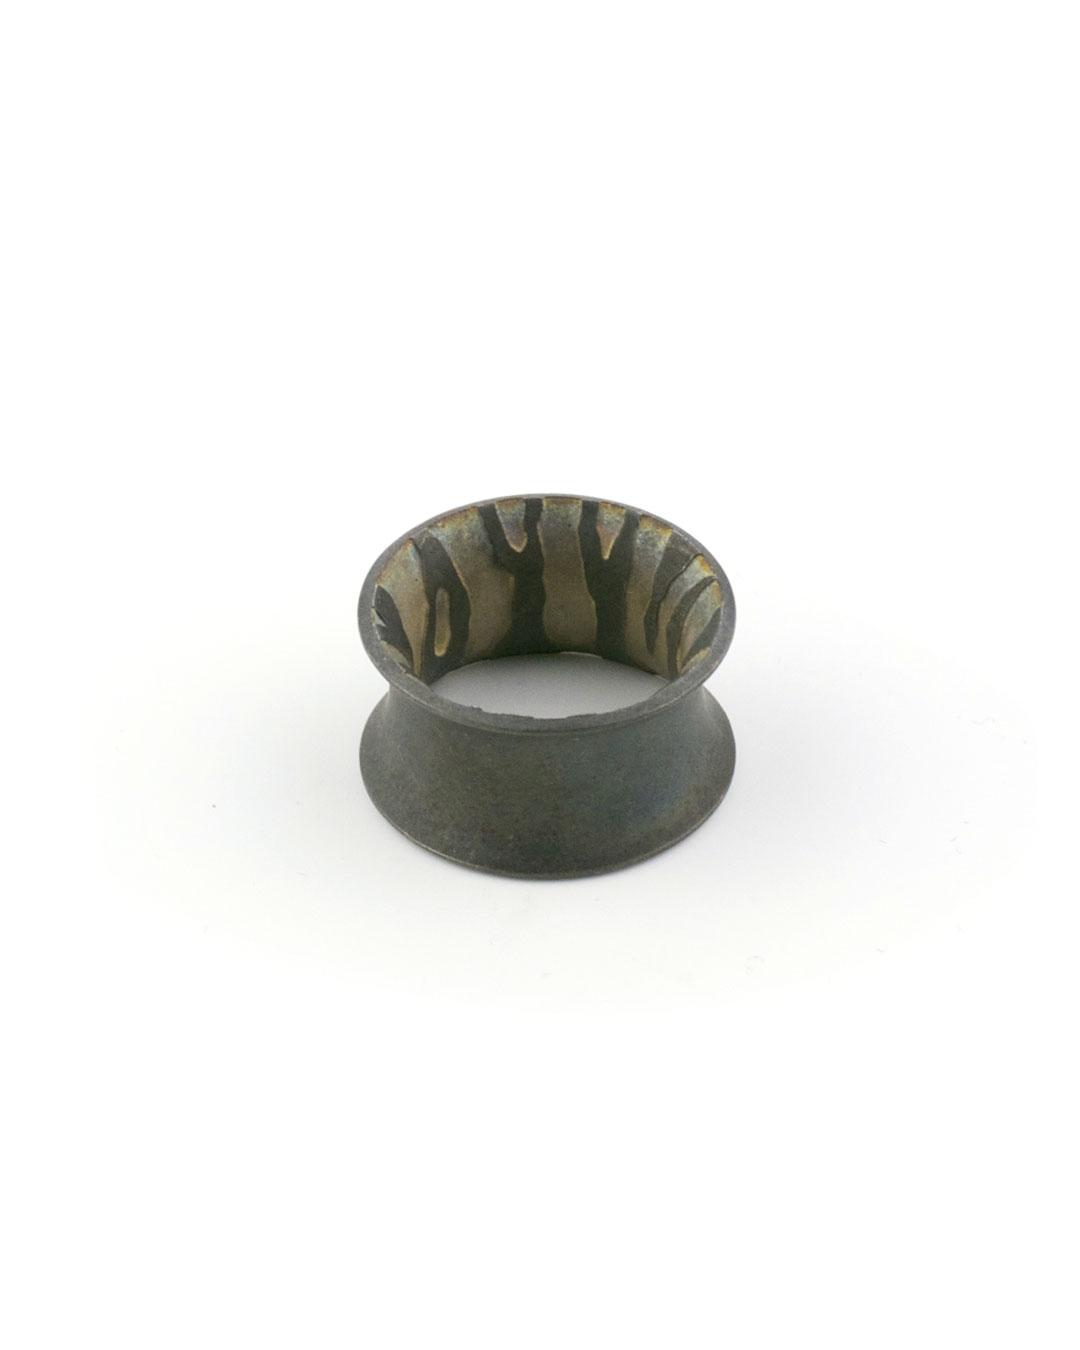 Akiko Kurihara untitled, 2007, ring; iron, 24 x 12 mm, €250